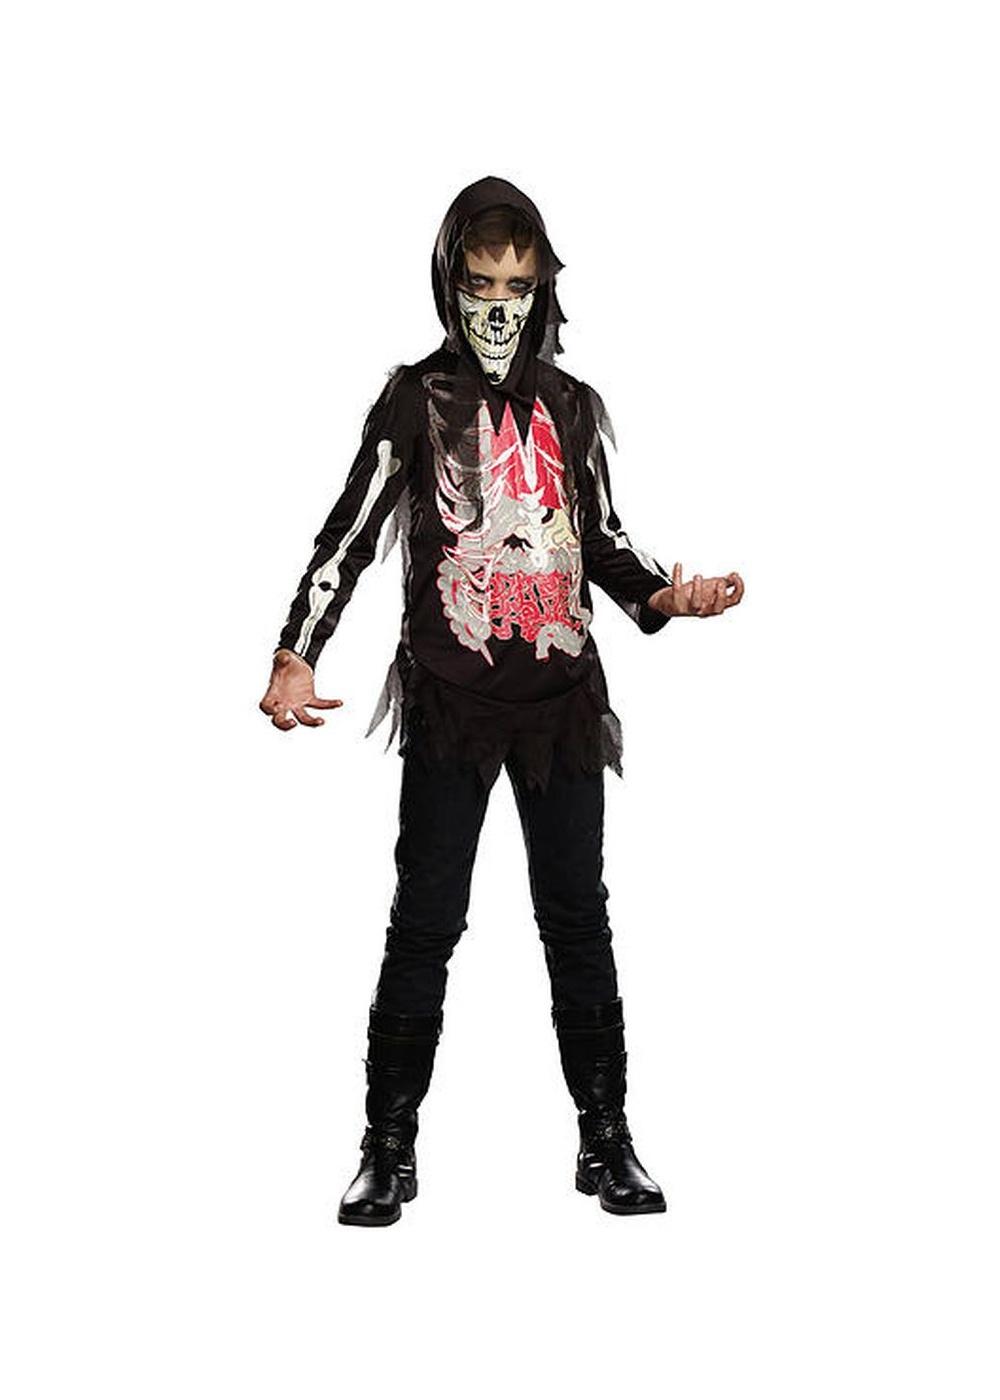 Plus Size Halloween Costume